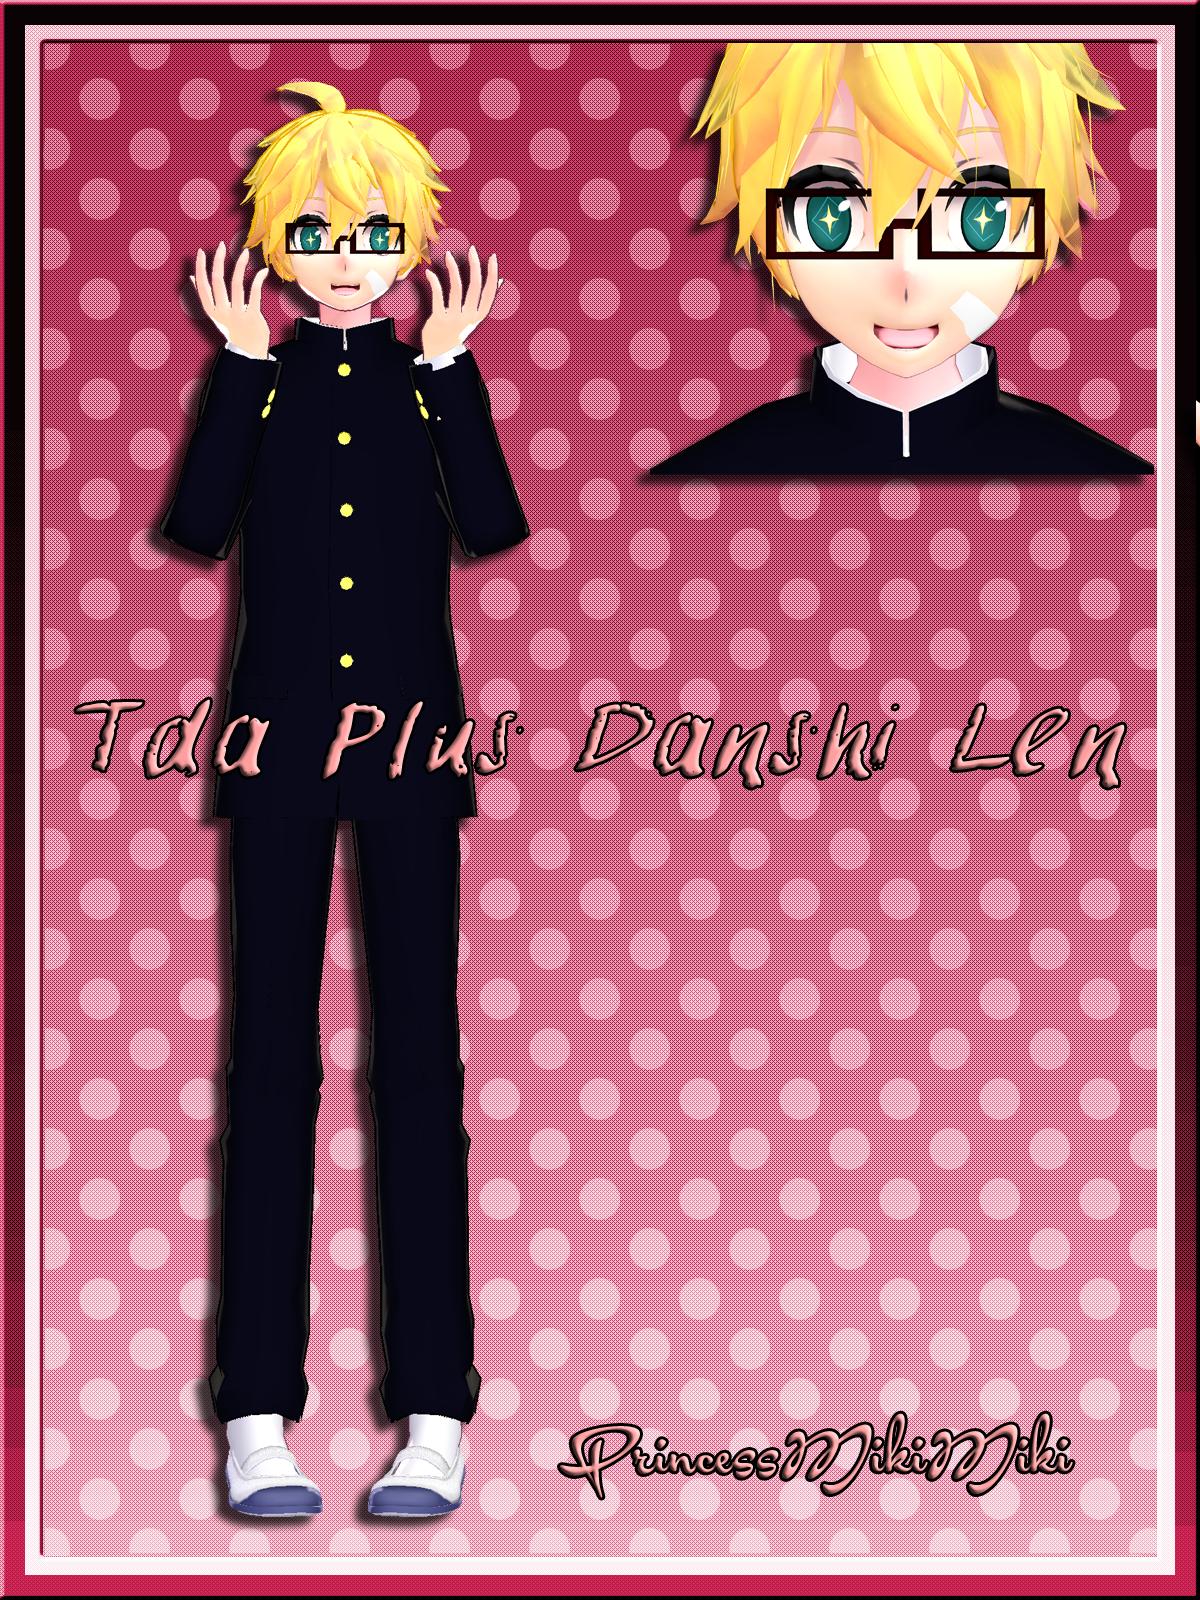 Tda Plus Danshi Len DL by PrincessMikiMiki